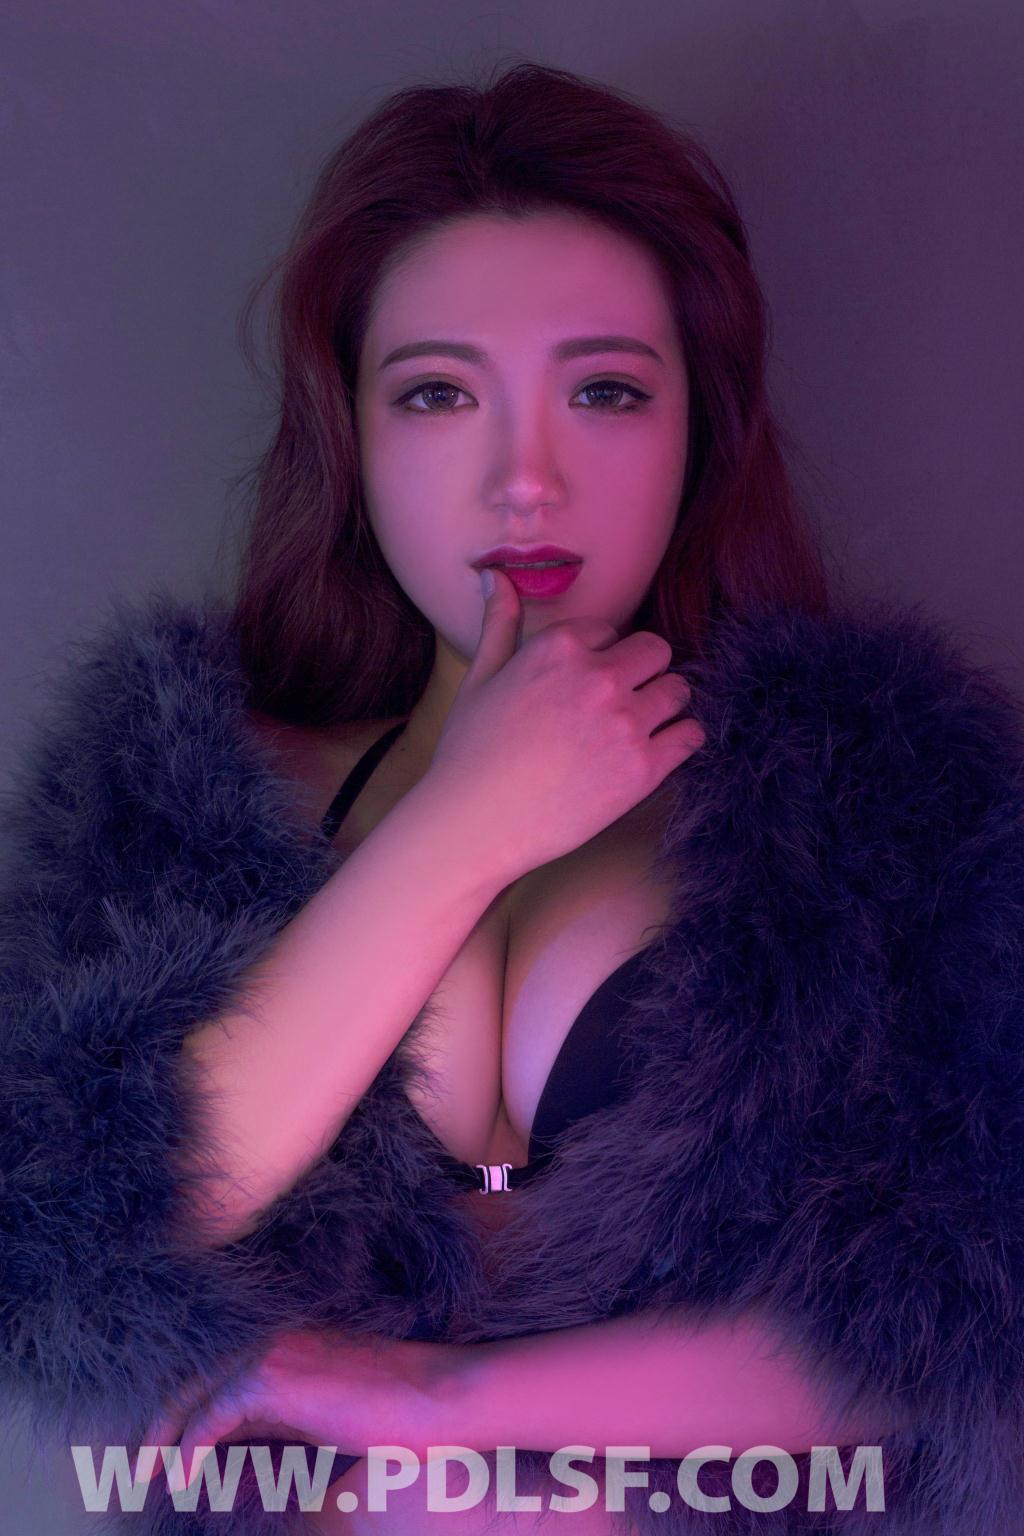 [PDL潘多拉] 【PartyCat轰趴猫】精品NO.228